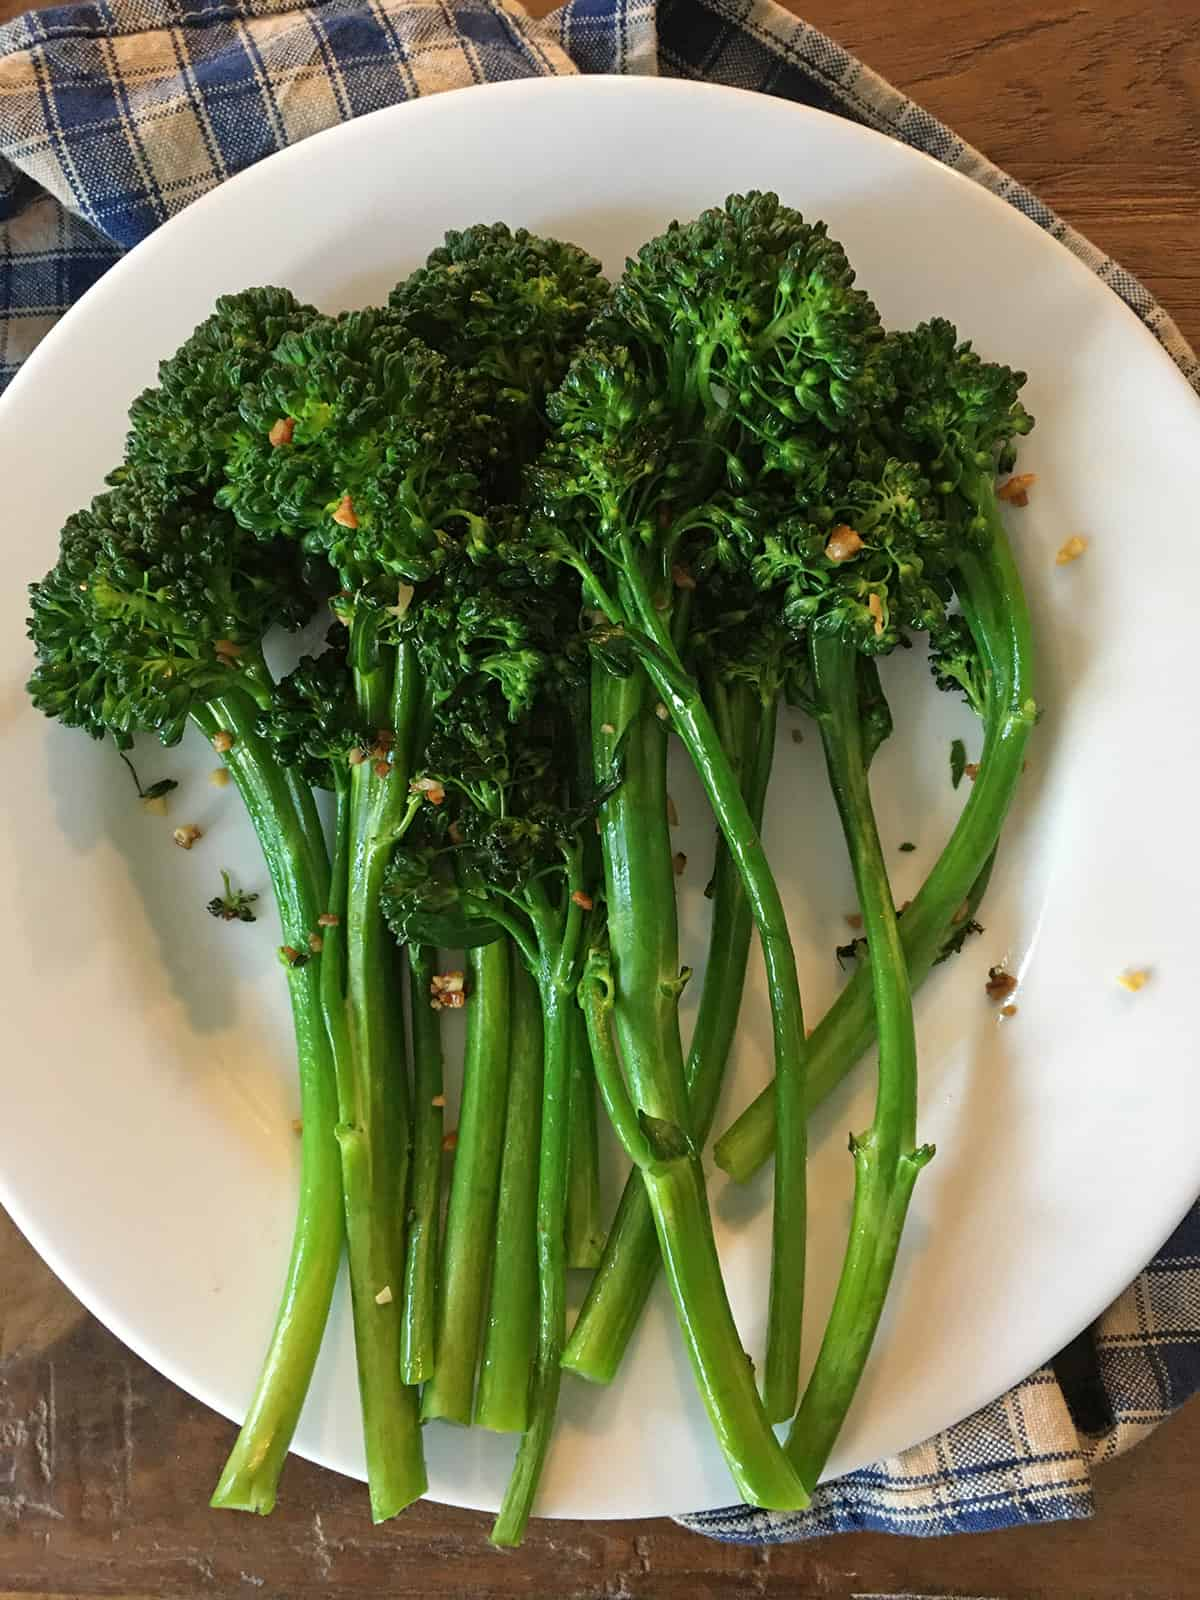 Sautéed broccolini with garlic on a white plate atop a blue and tan plaid napkin